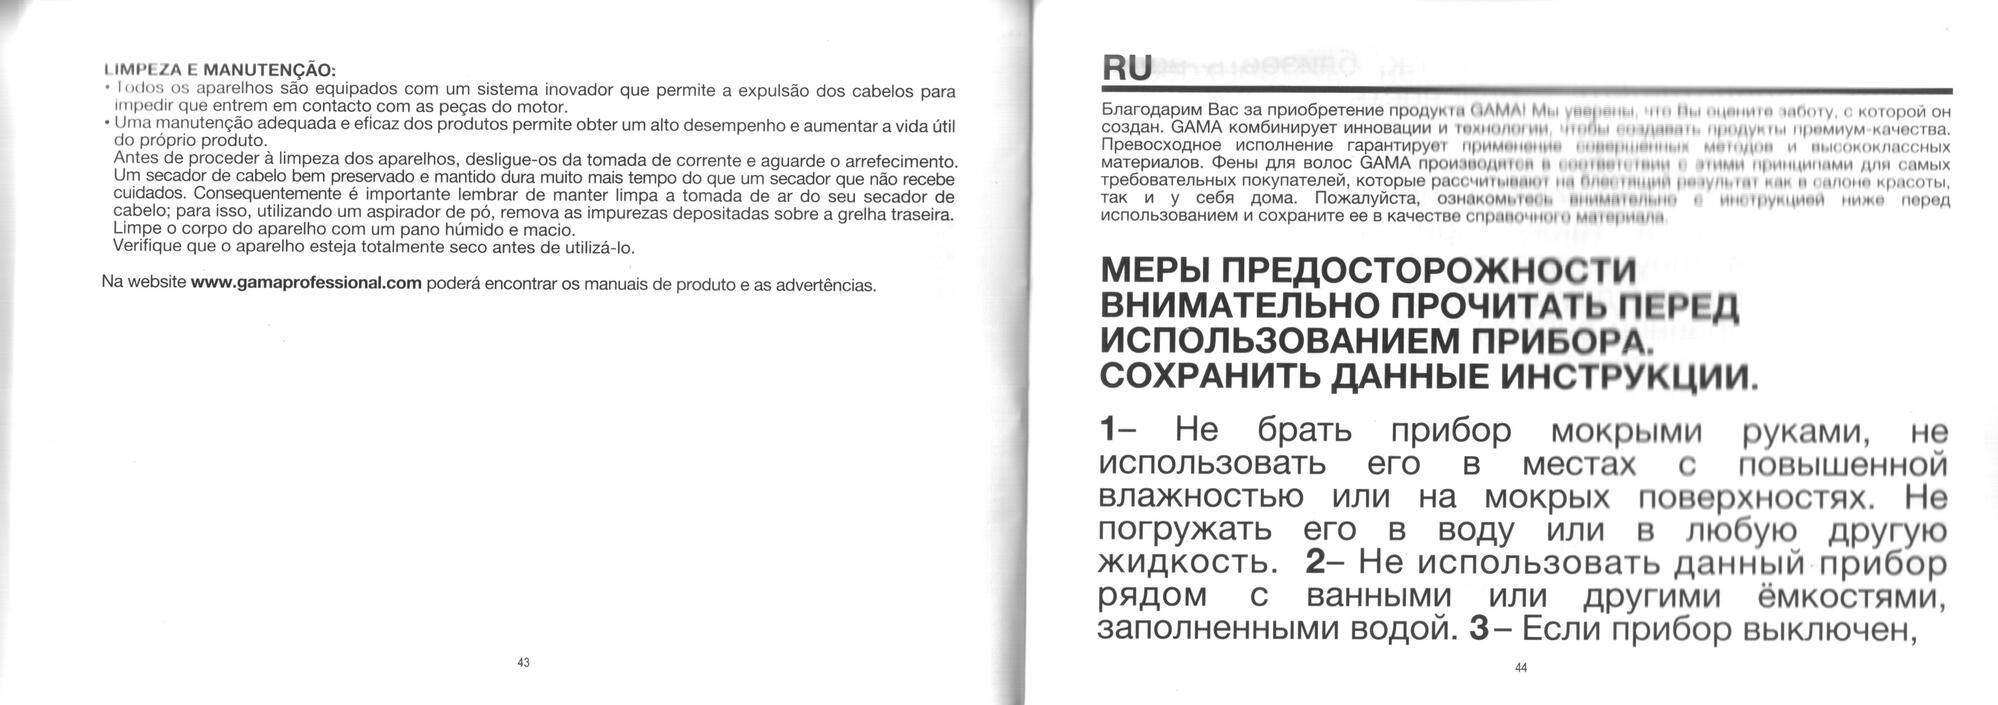 Bytovaya Tehnika - Obzor fena GA.MA GH3537 Diva 3D Keration